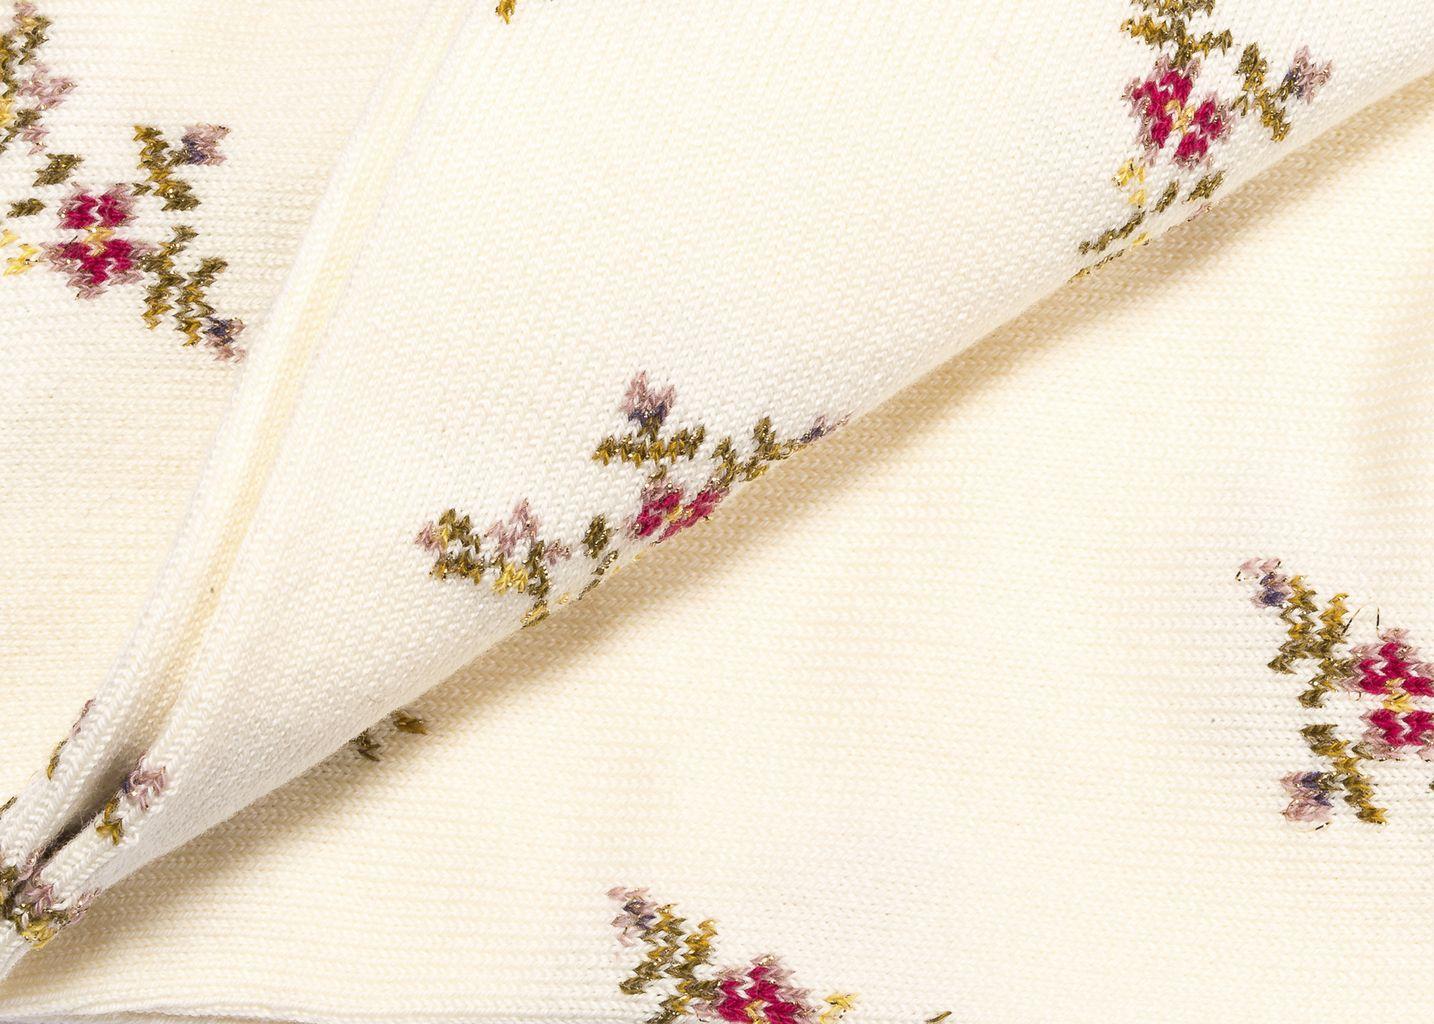 Chaussettes Lili  - Royalties